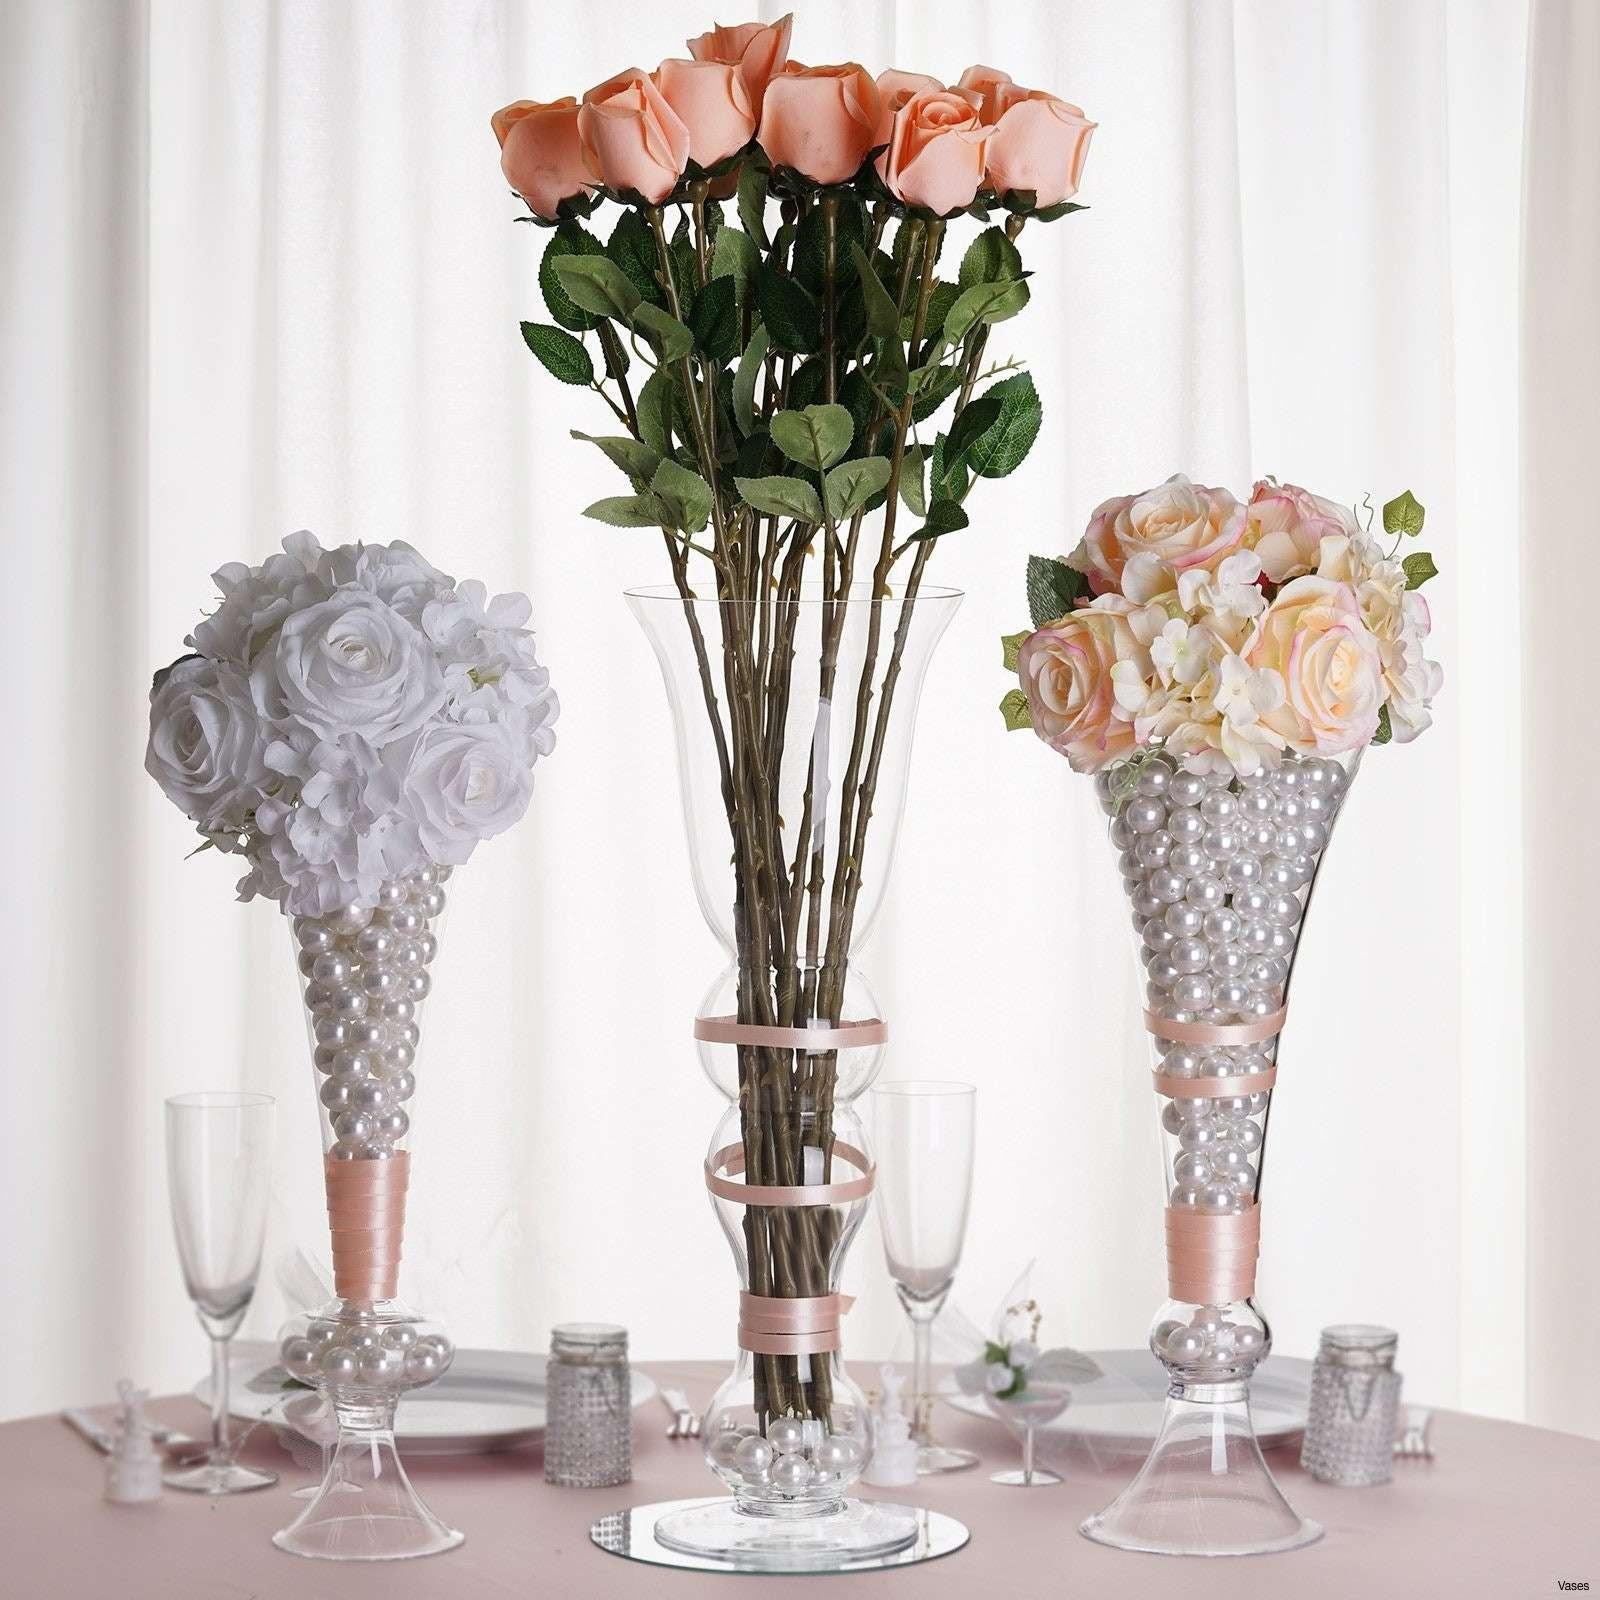 vintage small green glass vase of 27 elegant flower vase ideas for decorating flower decoration ideas in flower vase ideas for decorating best of flower vase table 04h vases tablei 0d clipart dining